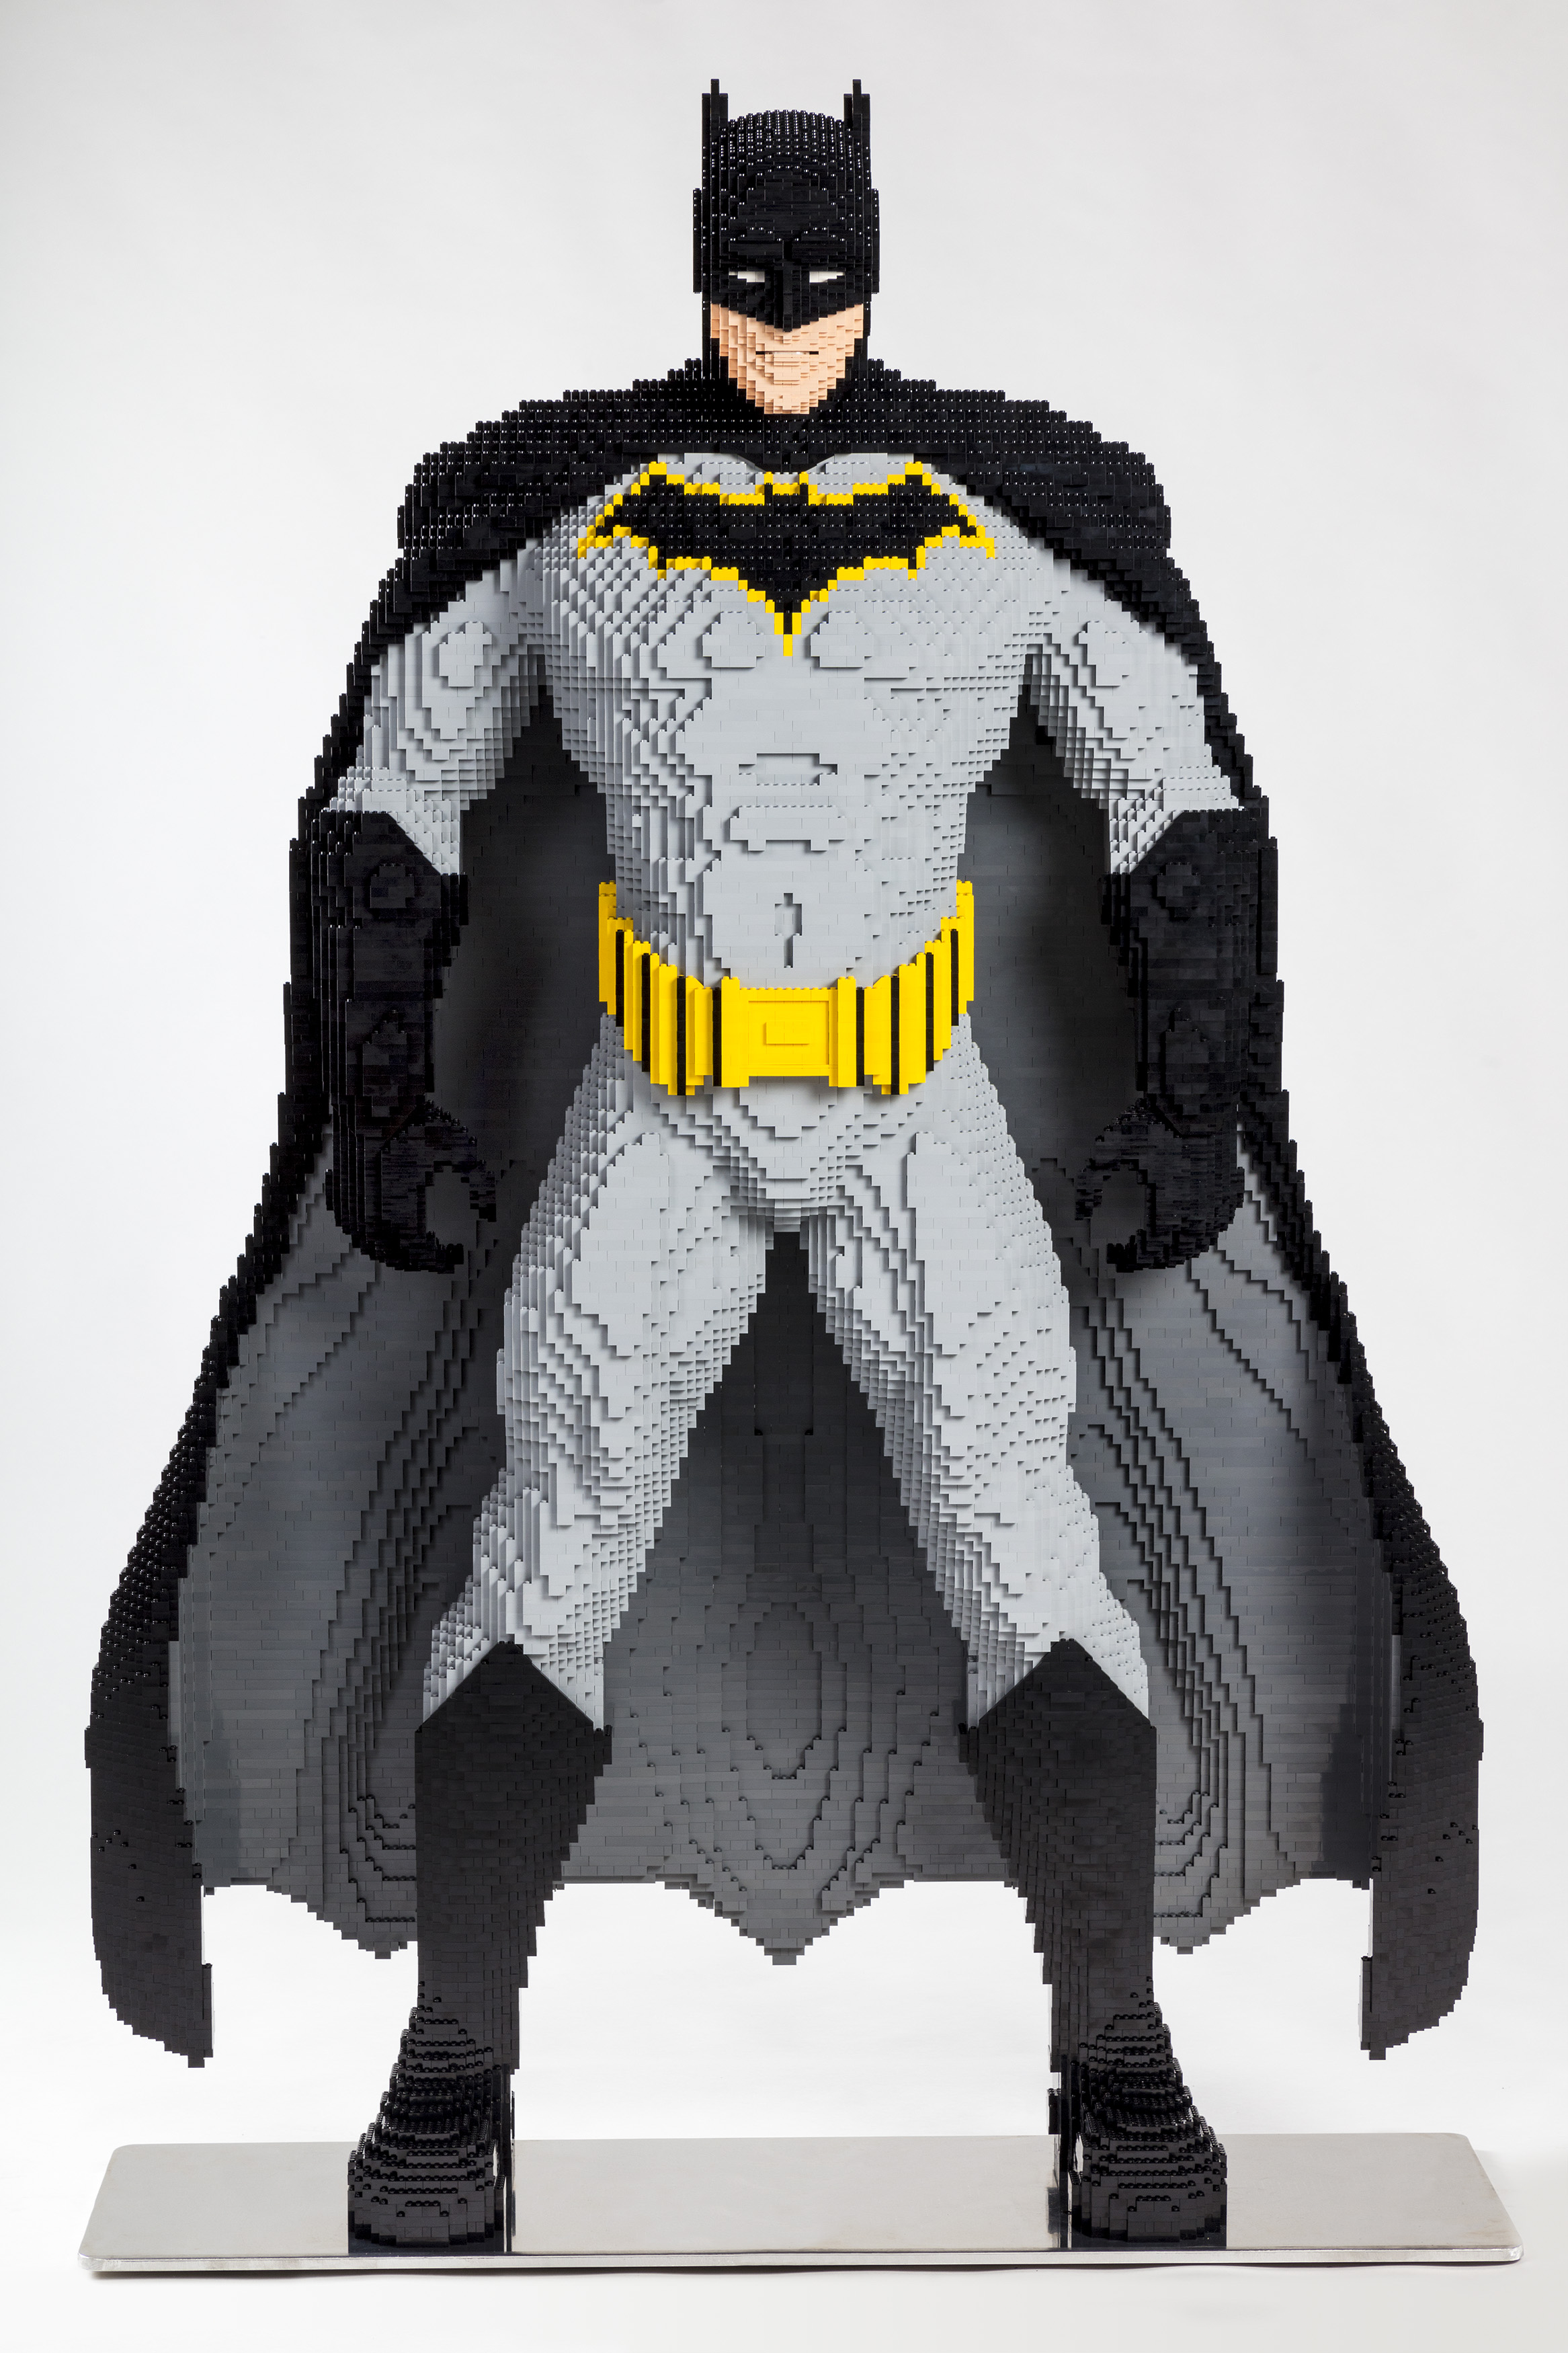 LEGO_Batman_SDCC2019_Front.jpg